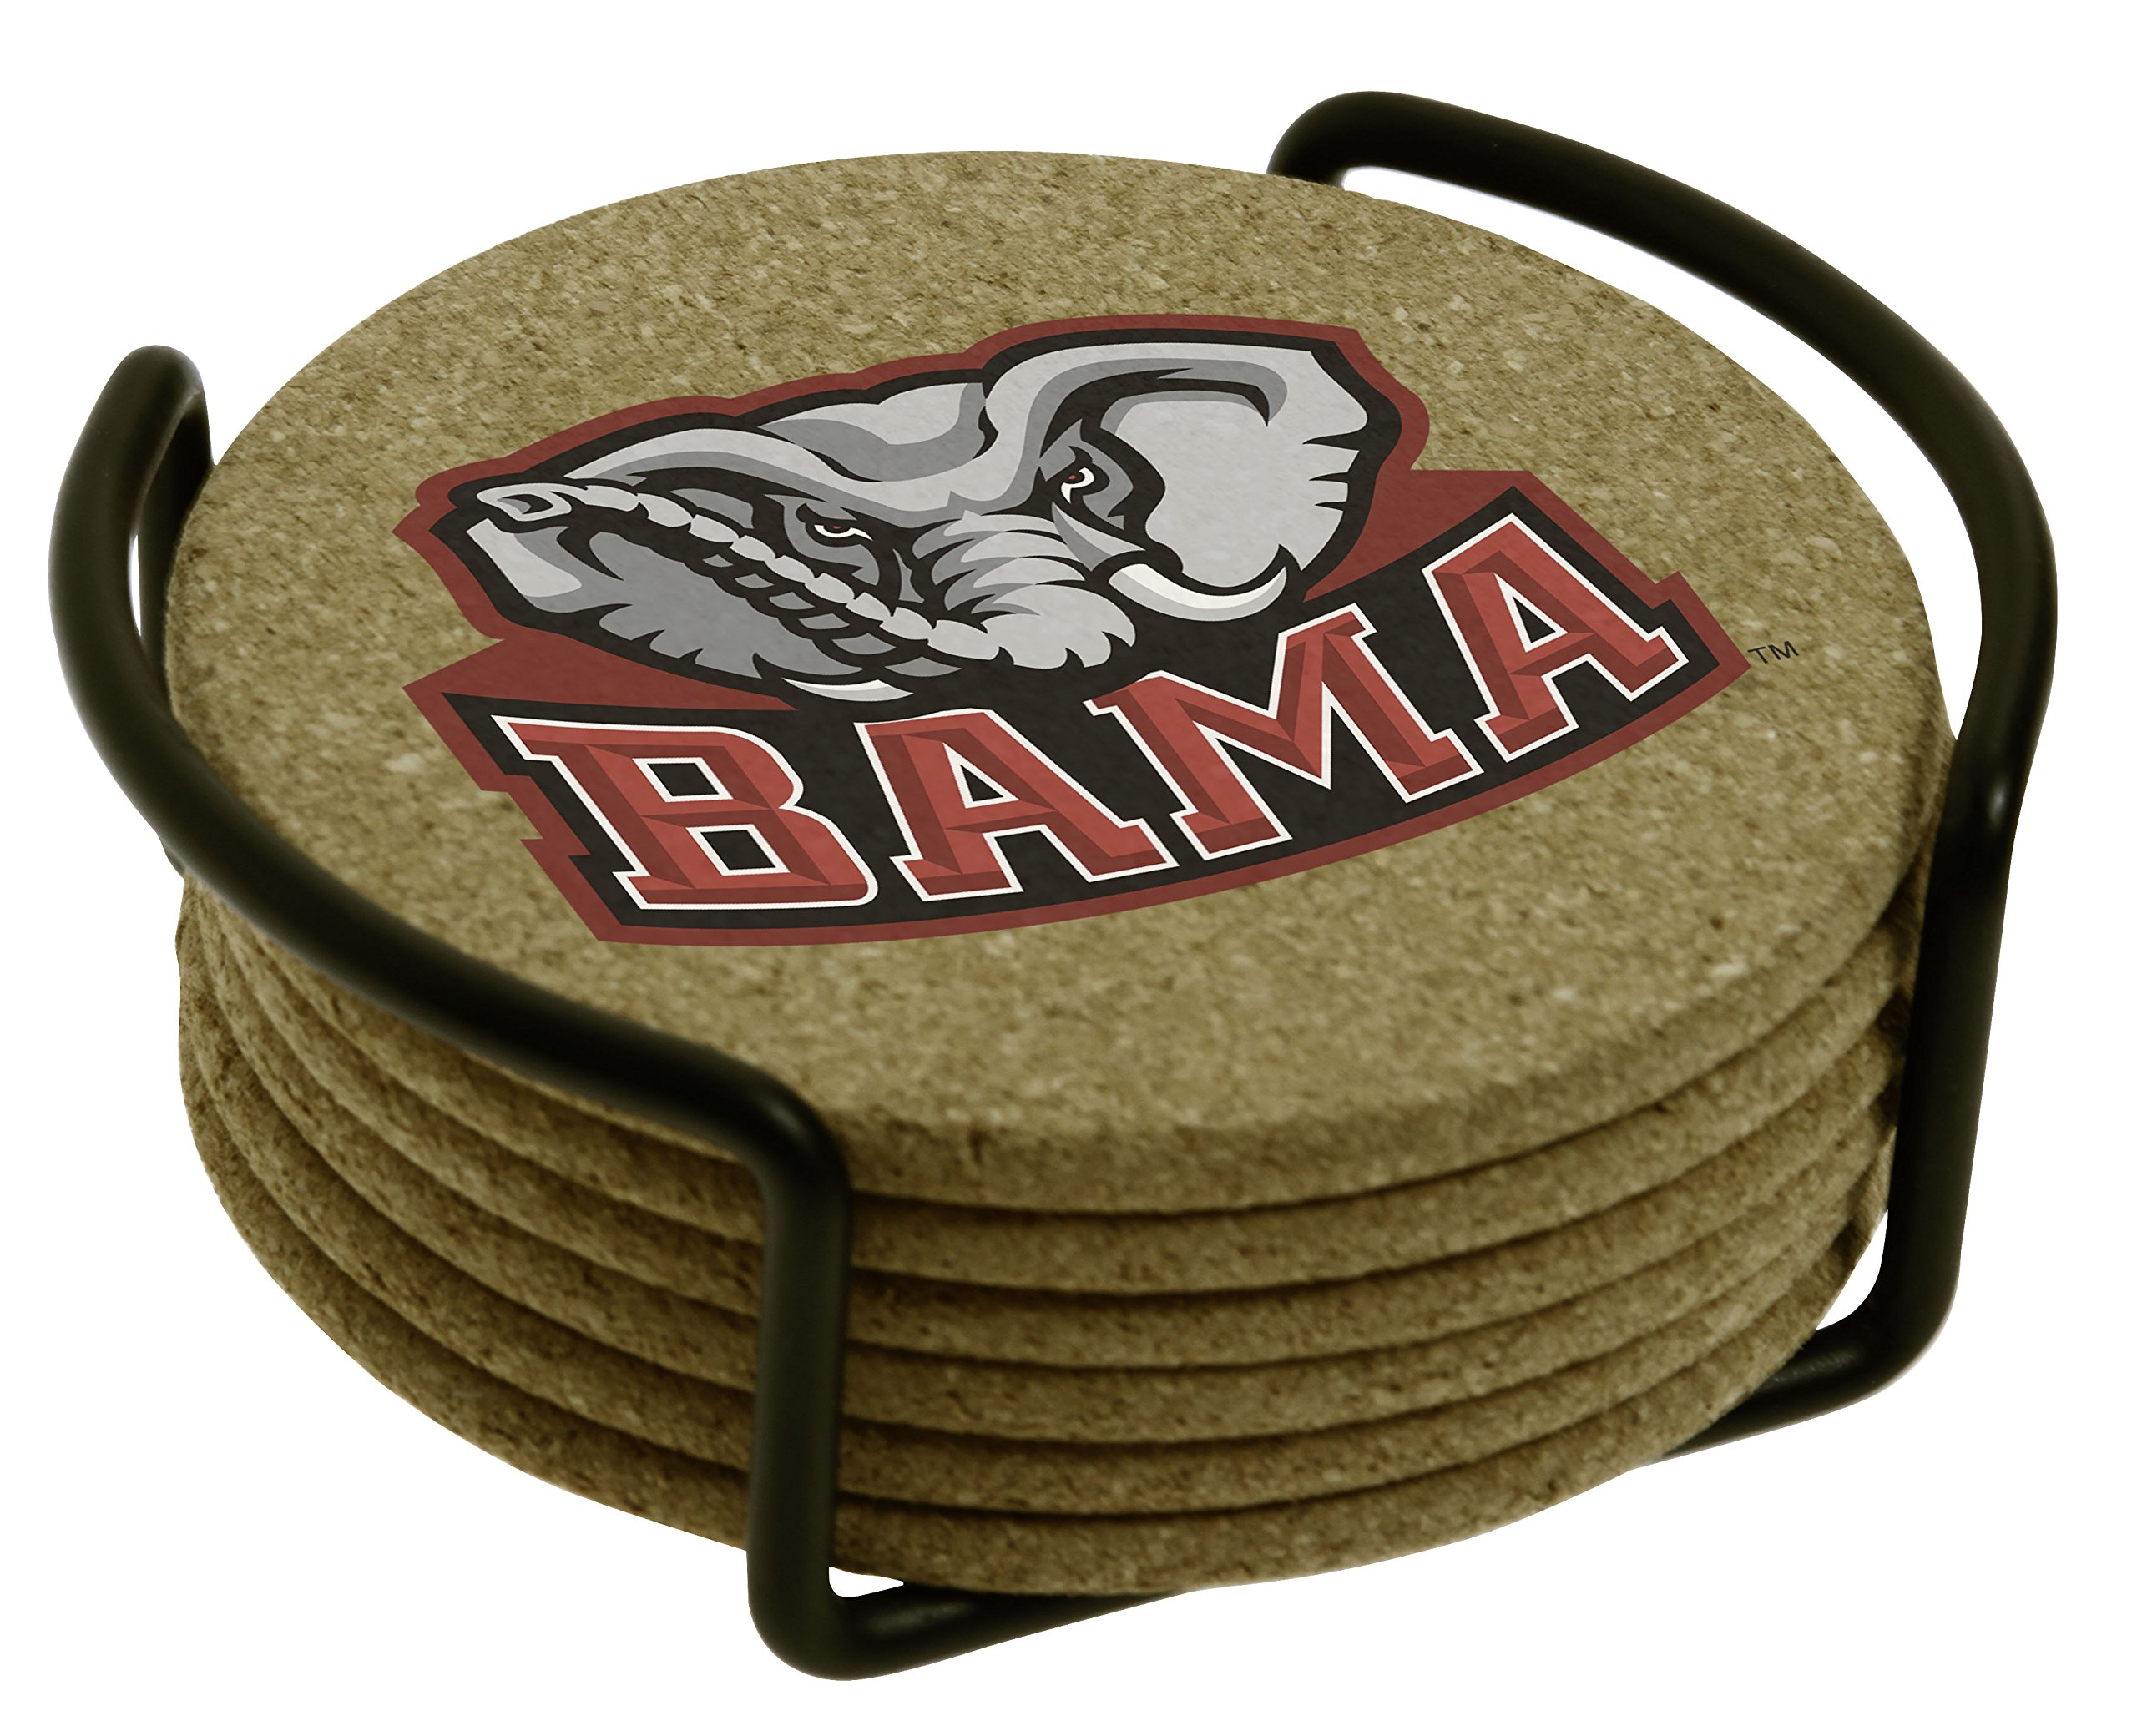 Thirstystone University of Alabama with Holder Included Cork Gift Set